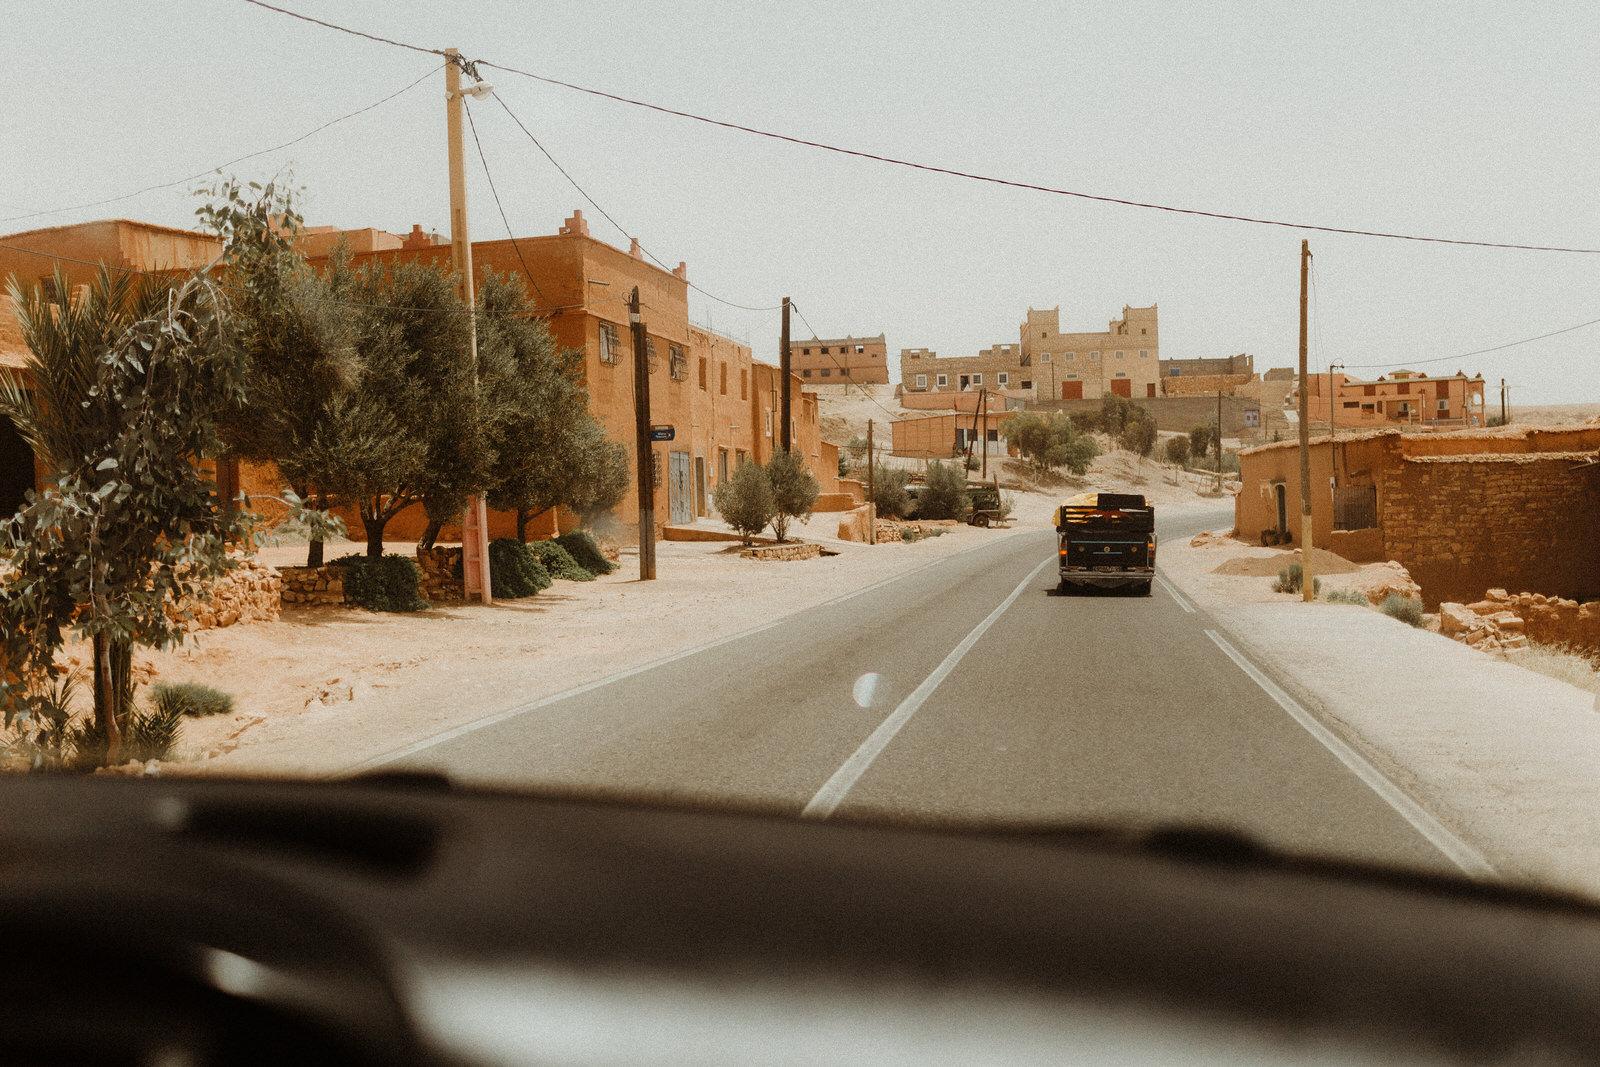 ouarzazate-road-love-road-cinema-morocco